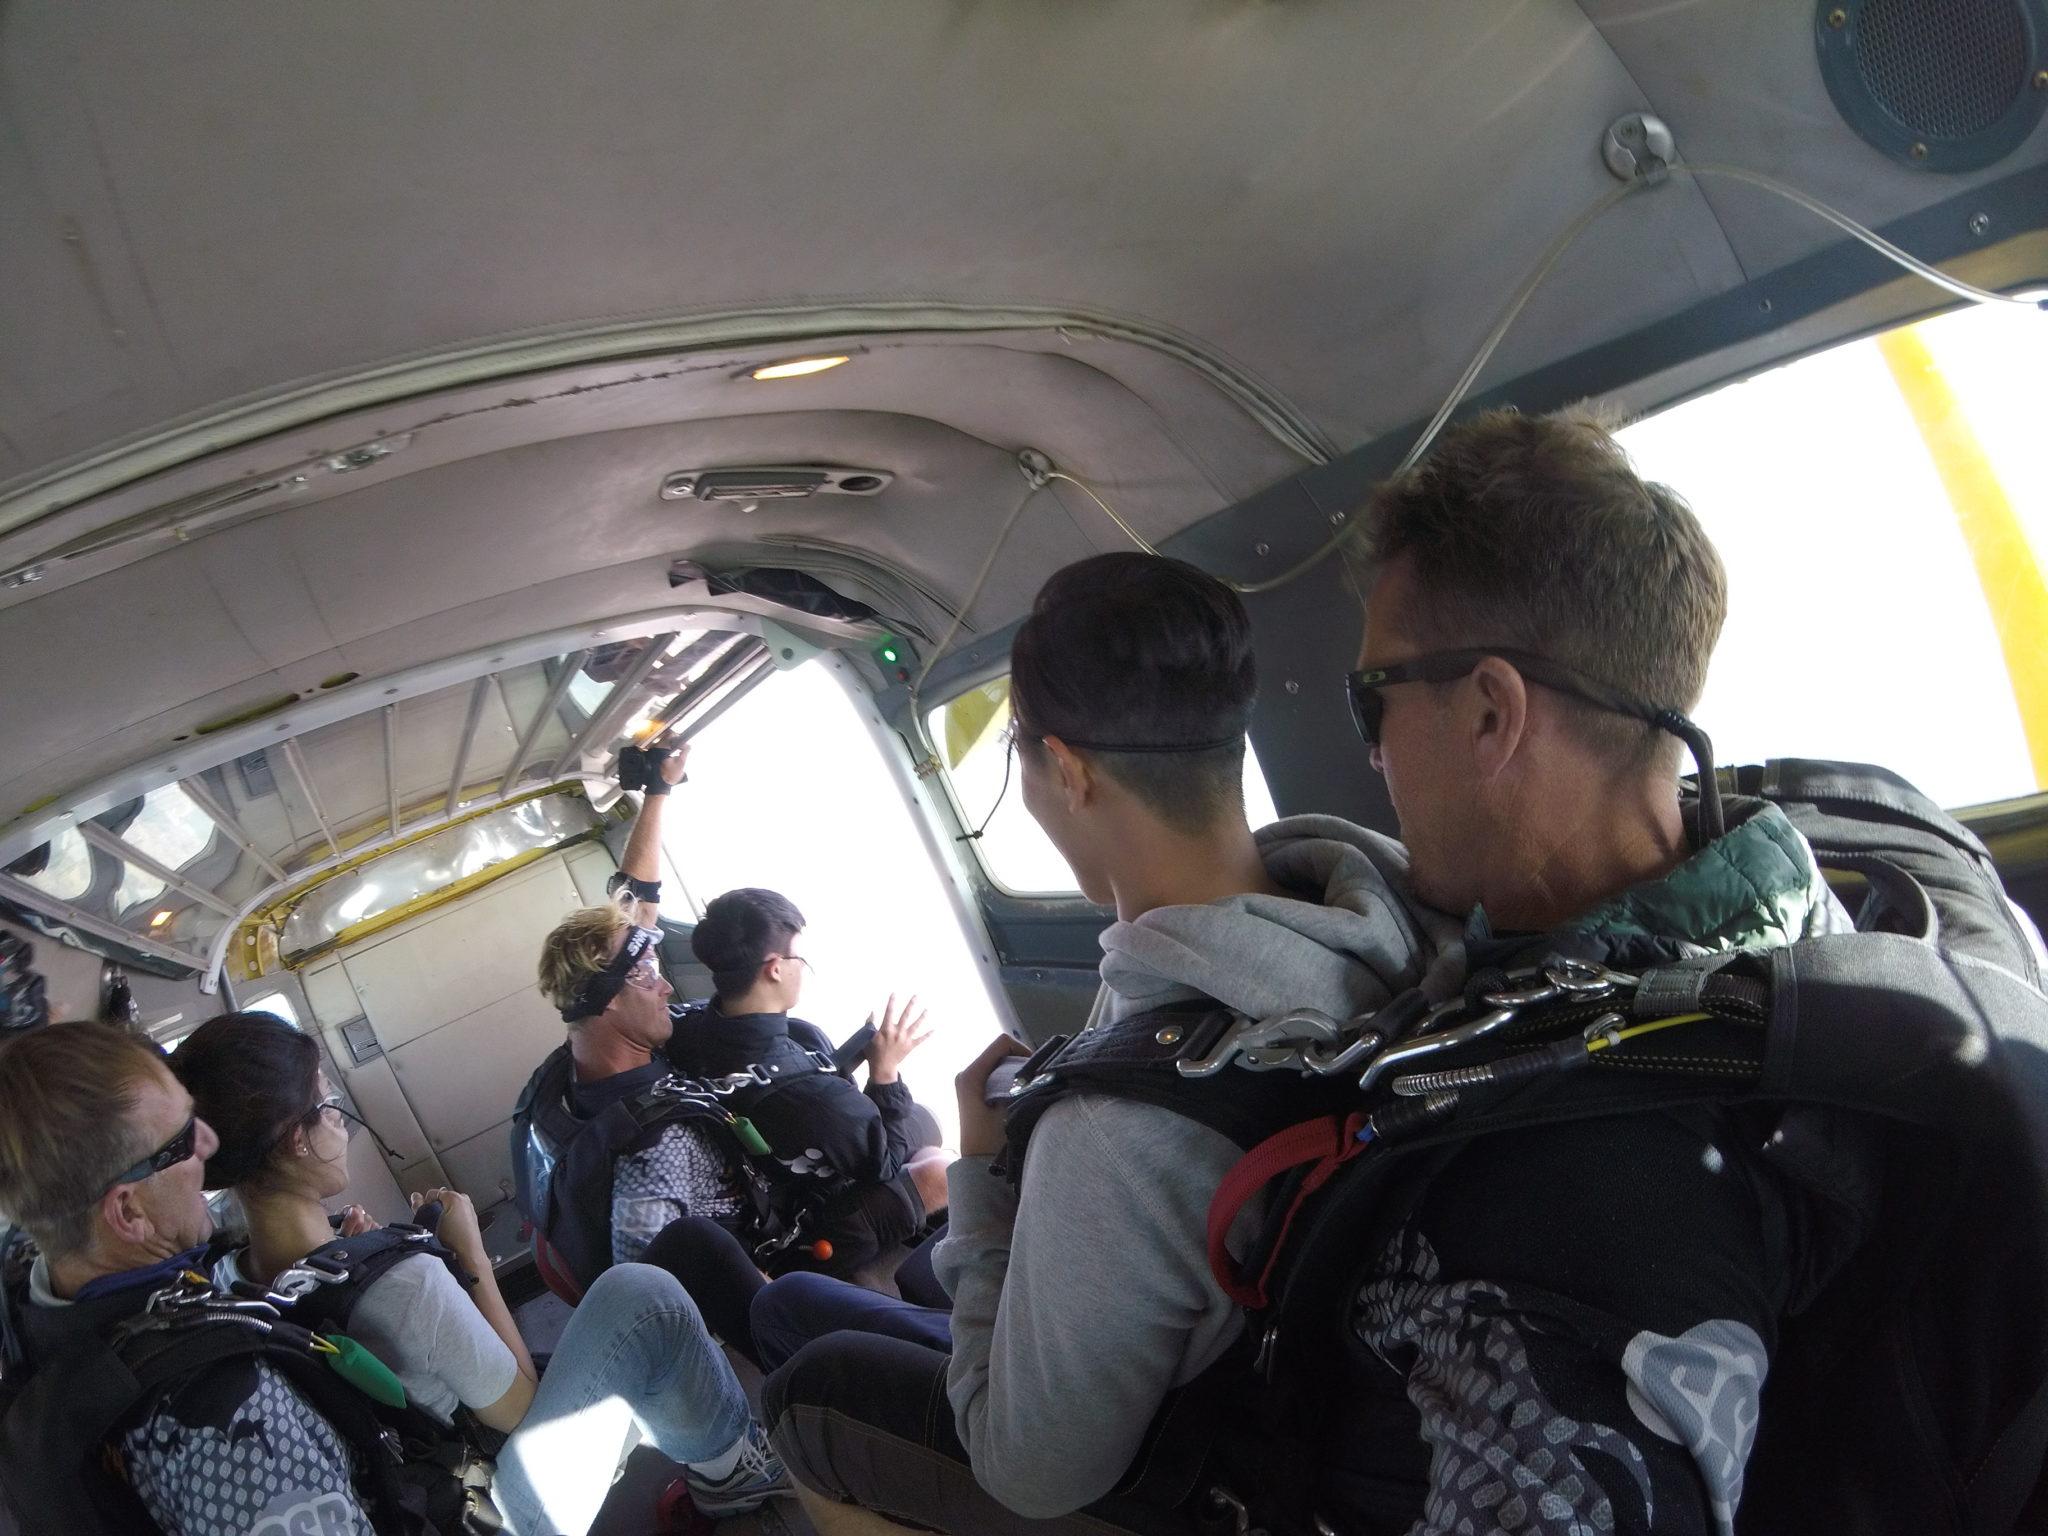 tandem skydivers getting ready to jump out of a plane at Skydive Santa Barbara